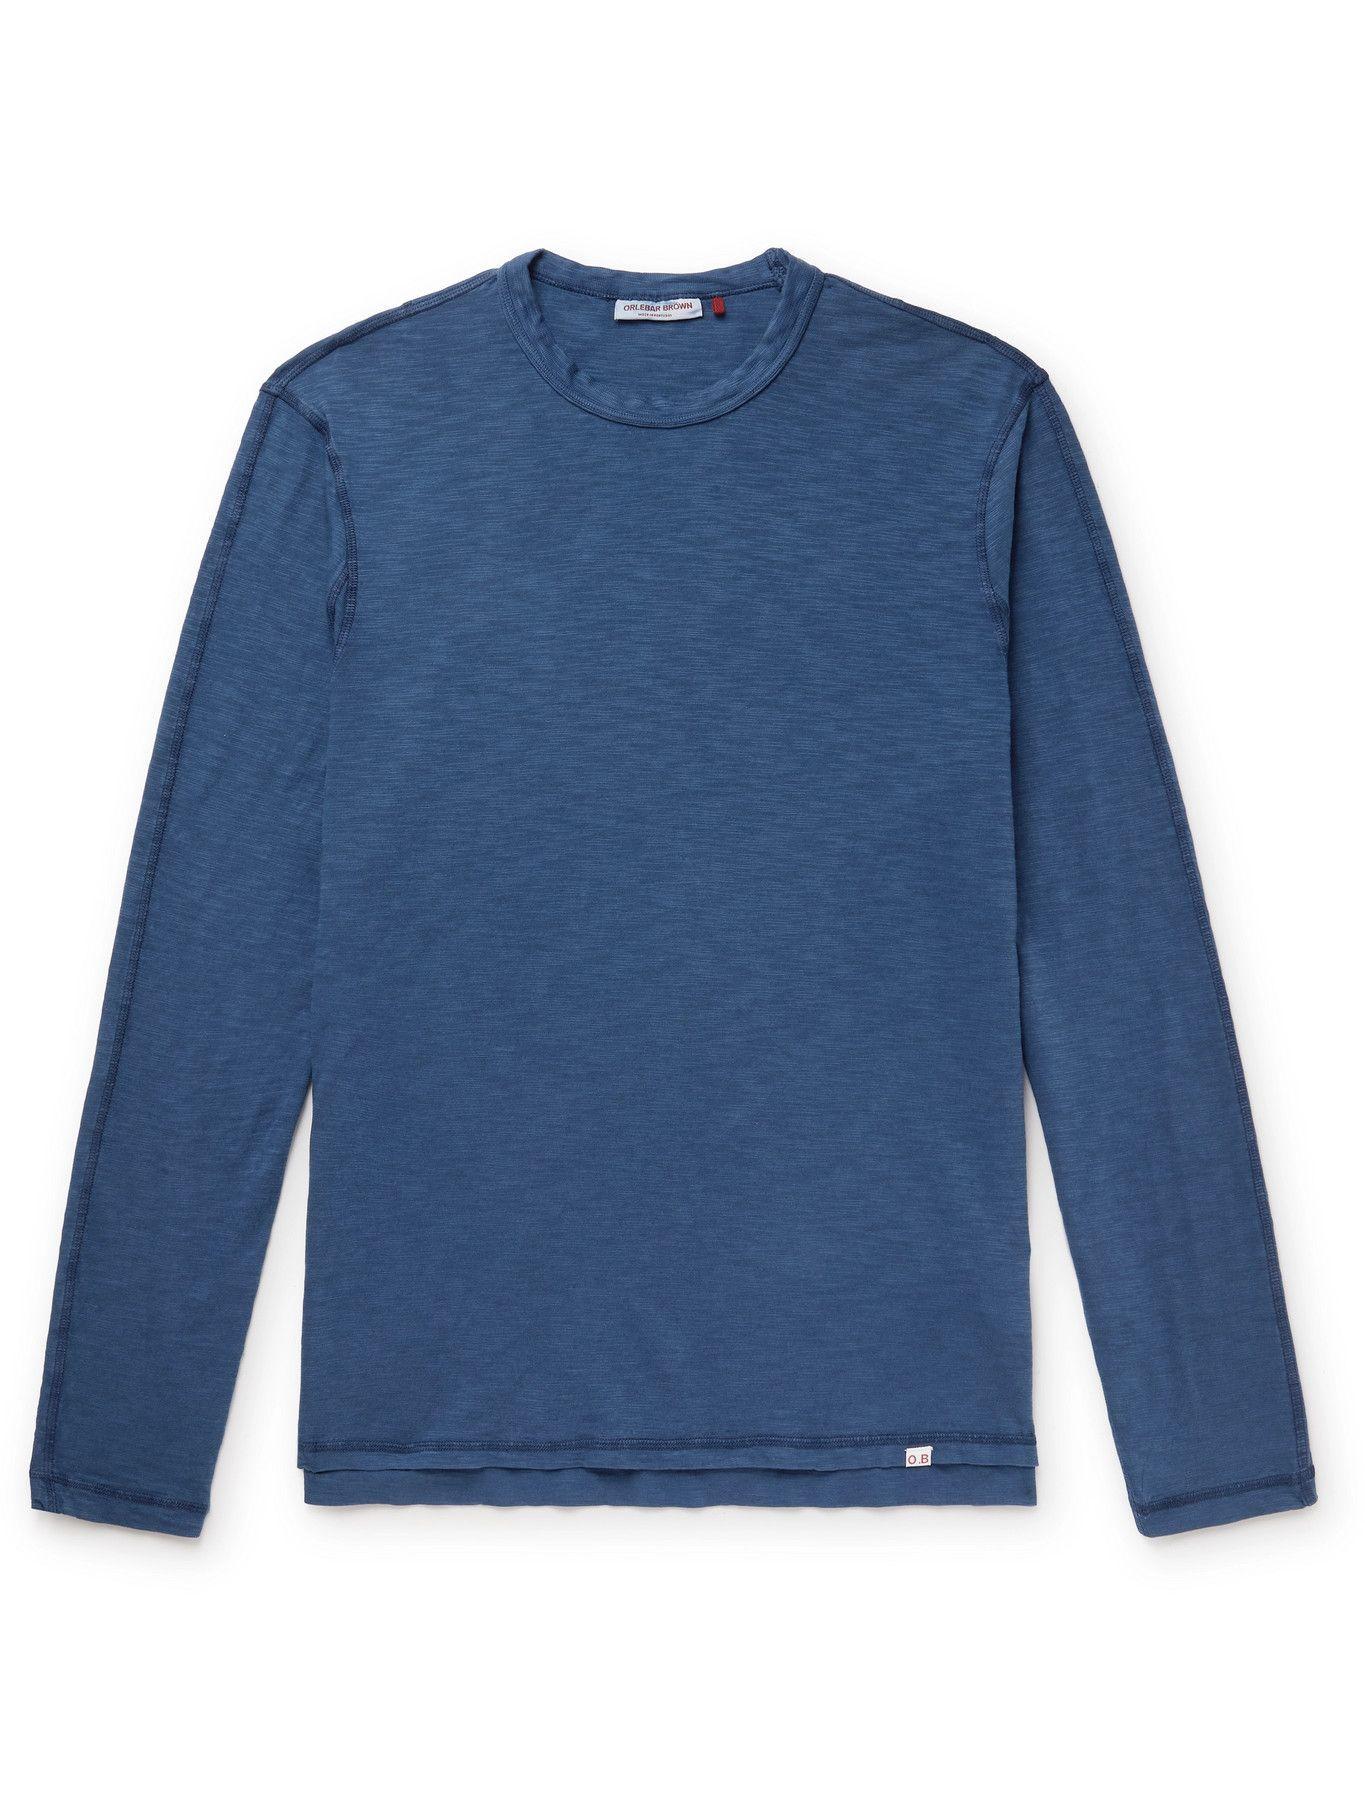 Photo: ORLEBAR BROWN - Sammy Garment-Dyed Cotton T-Shirt - Blue